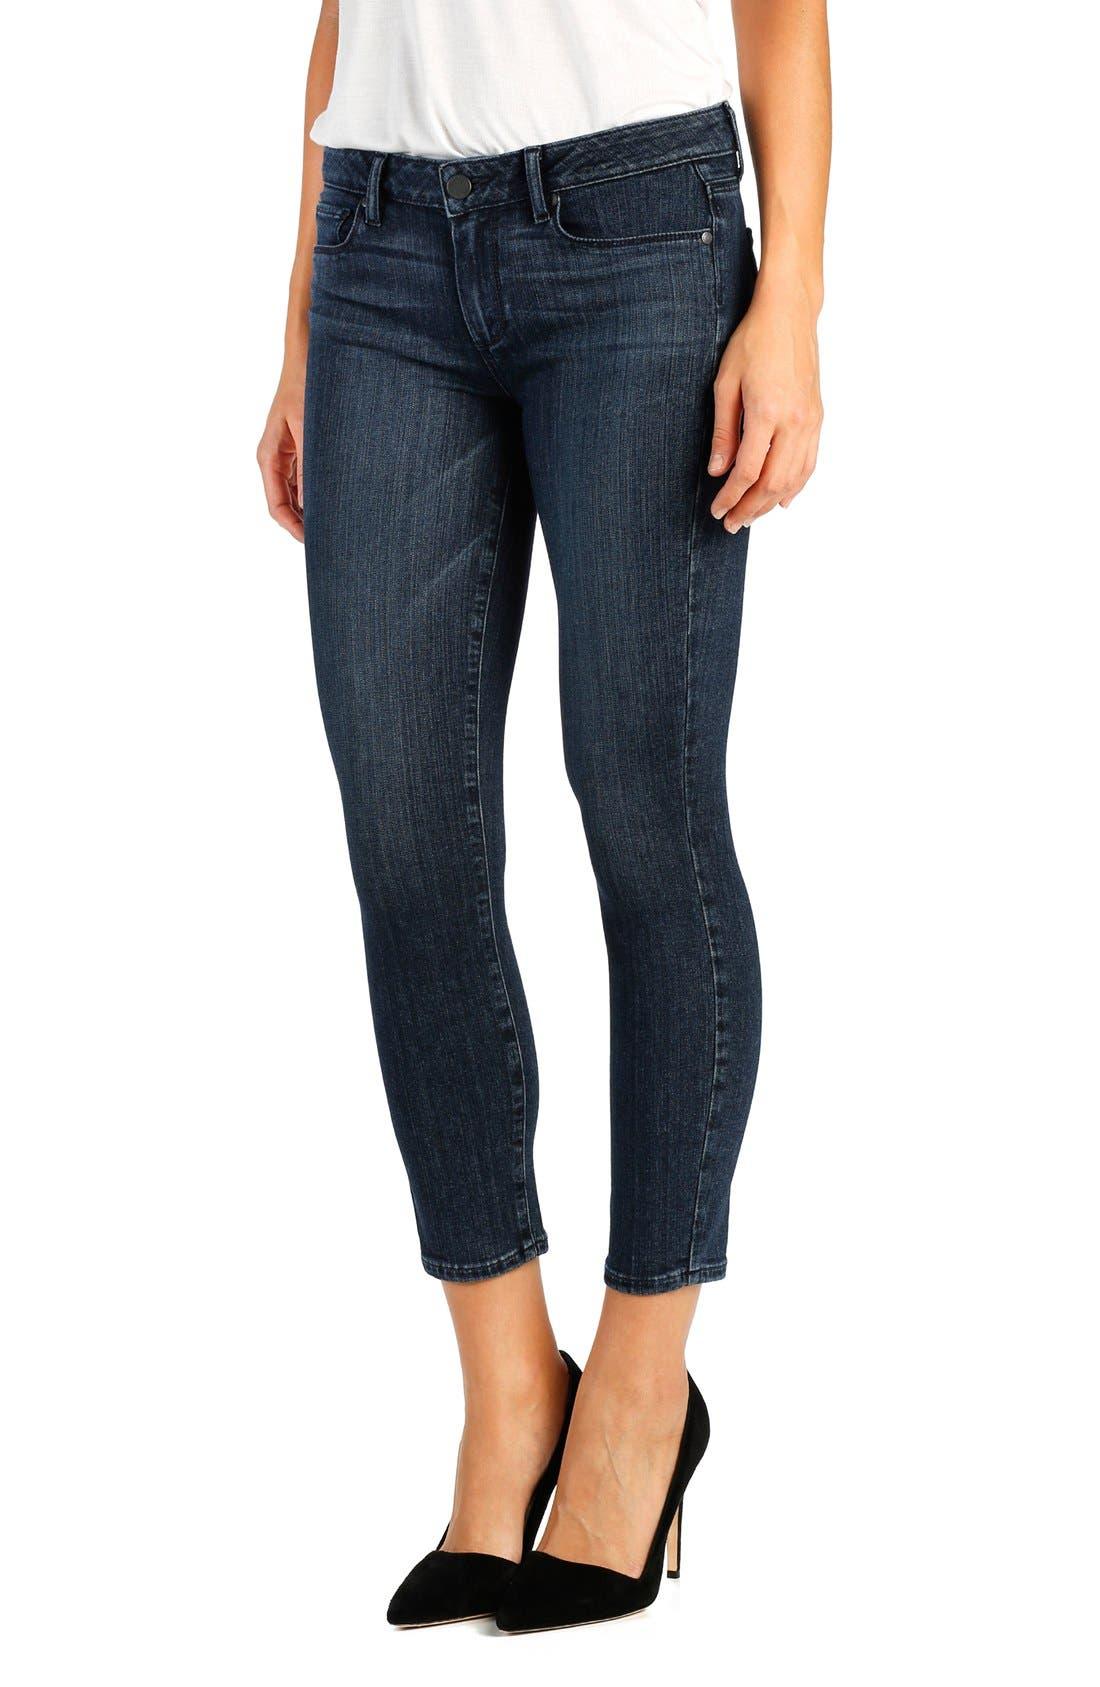 Main Image - PAIGE 'Transcend - Verdugo' Crop Skinny Jeans (Shelby)